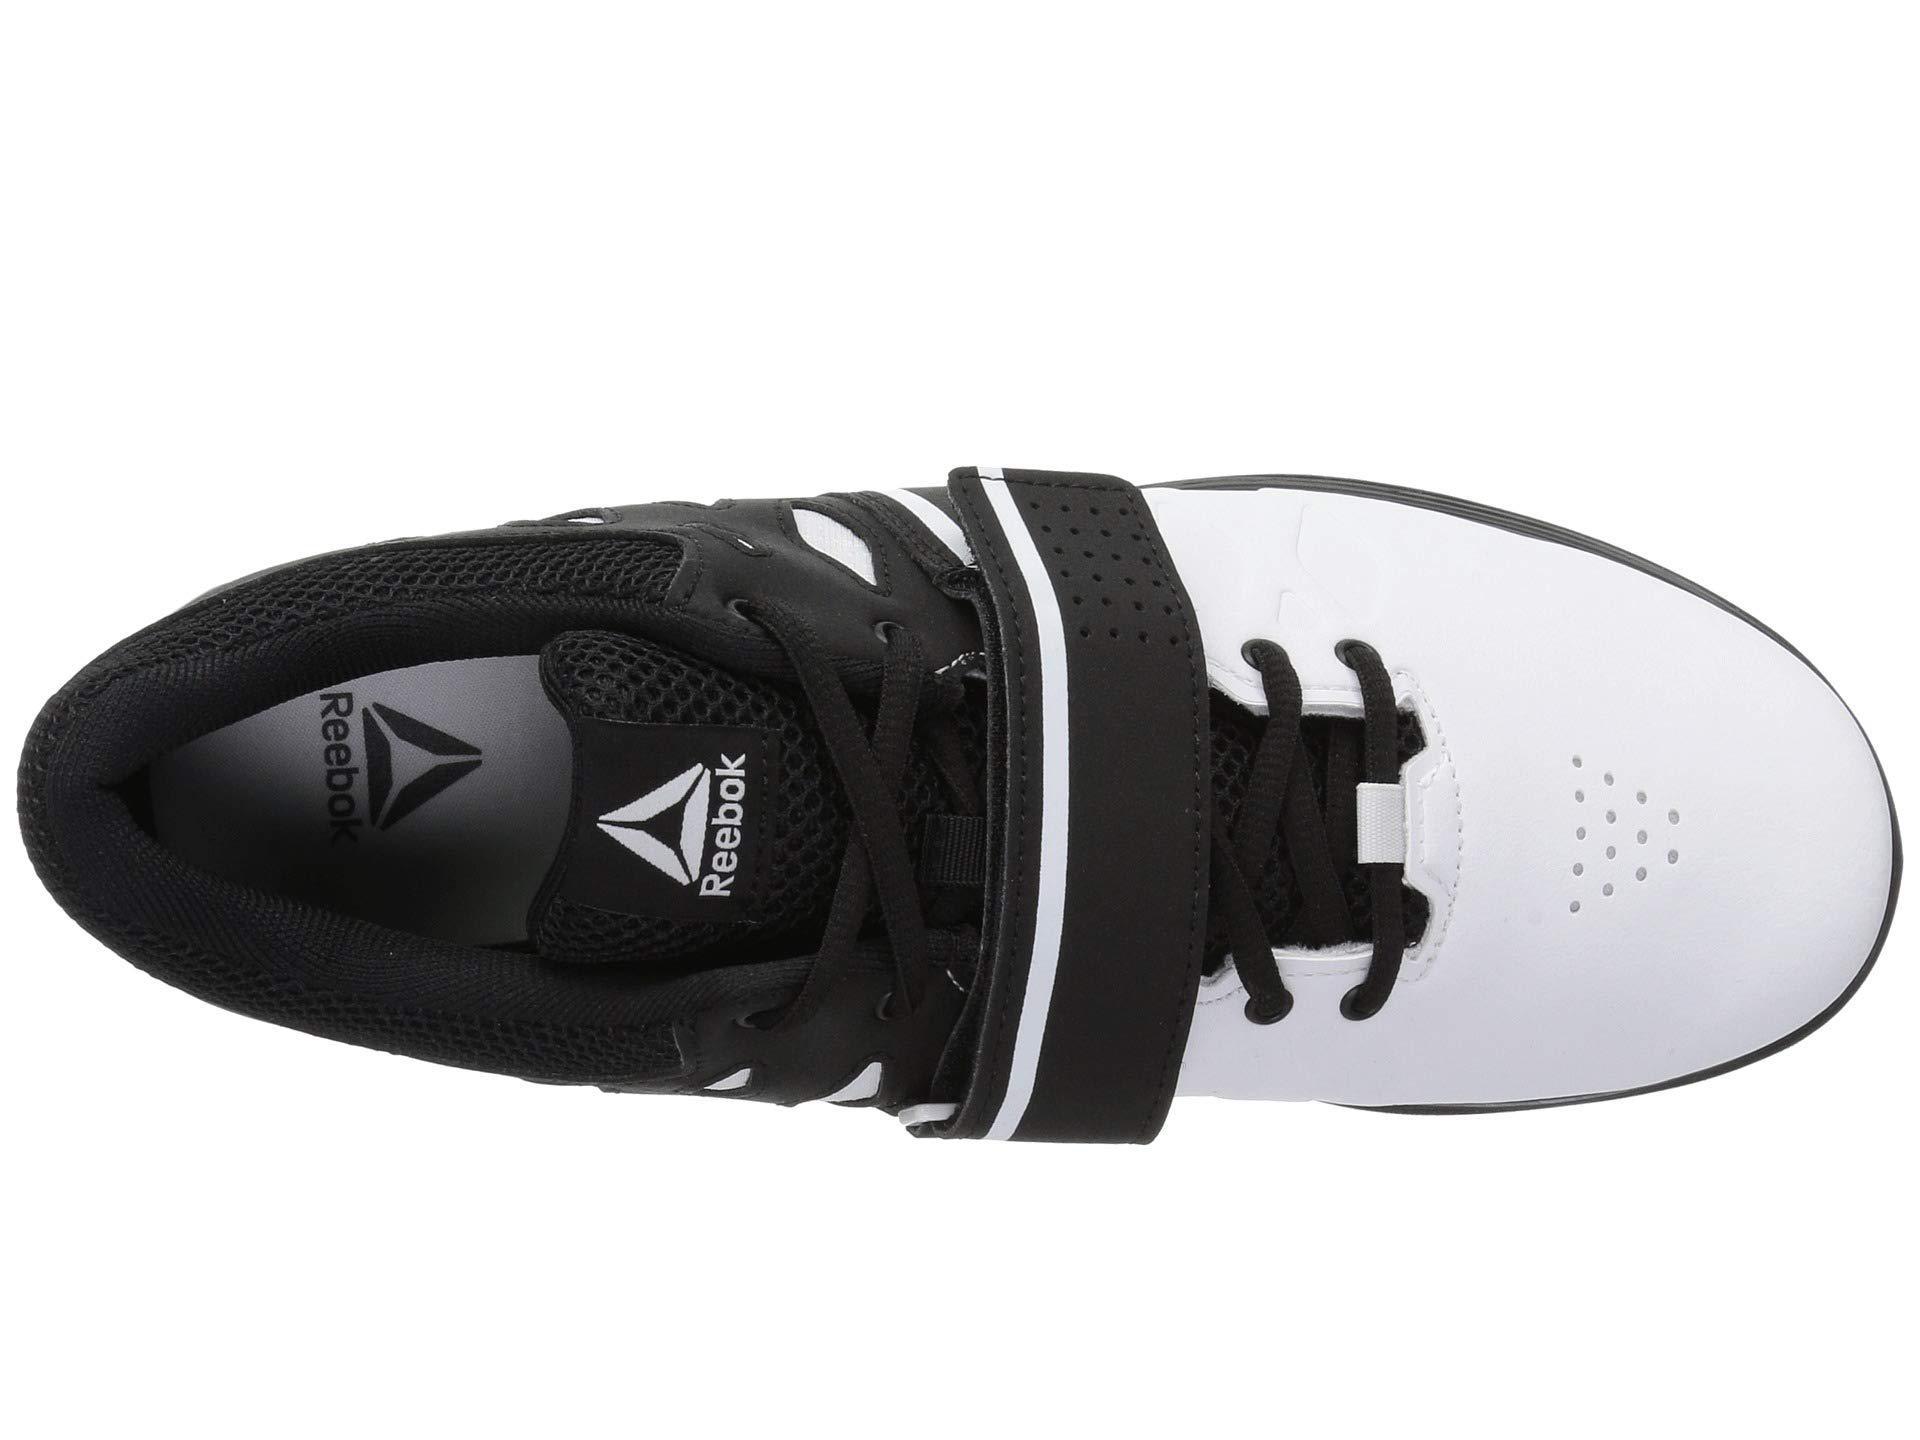 31a980d93ba31e Reebok - Lifter Pr (white black) Men s Cross Training Shoes for Men -. View  fullscreen